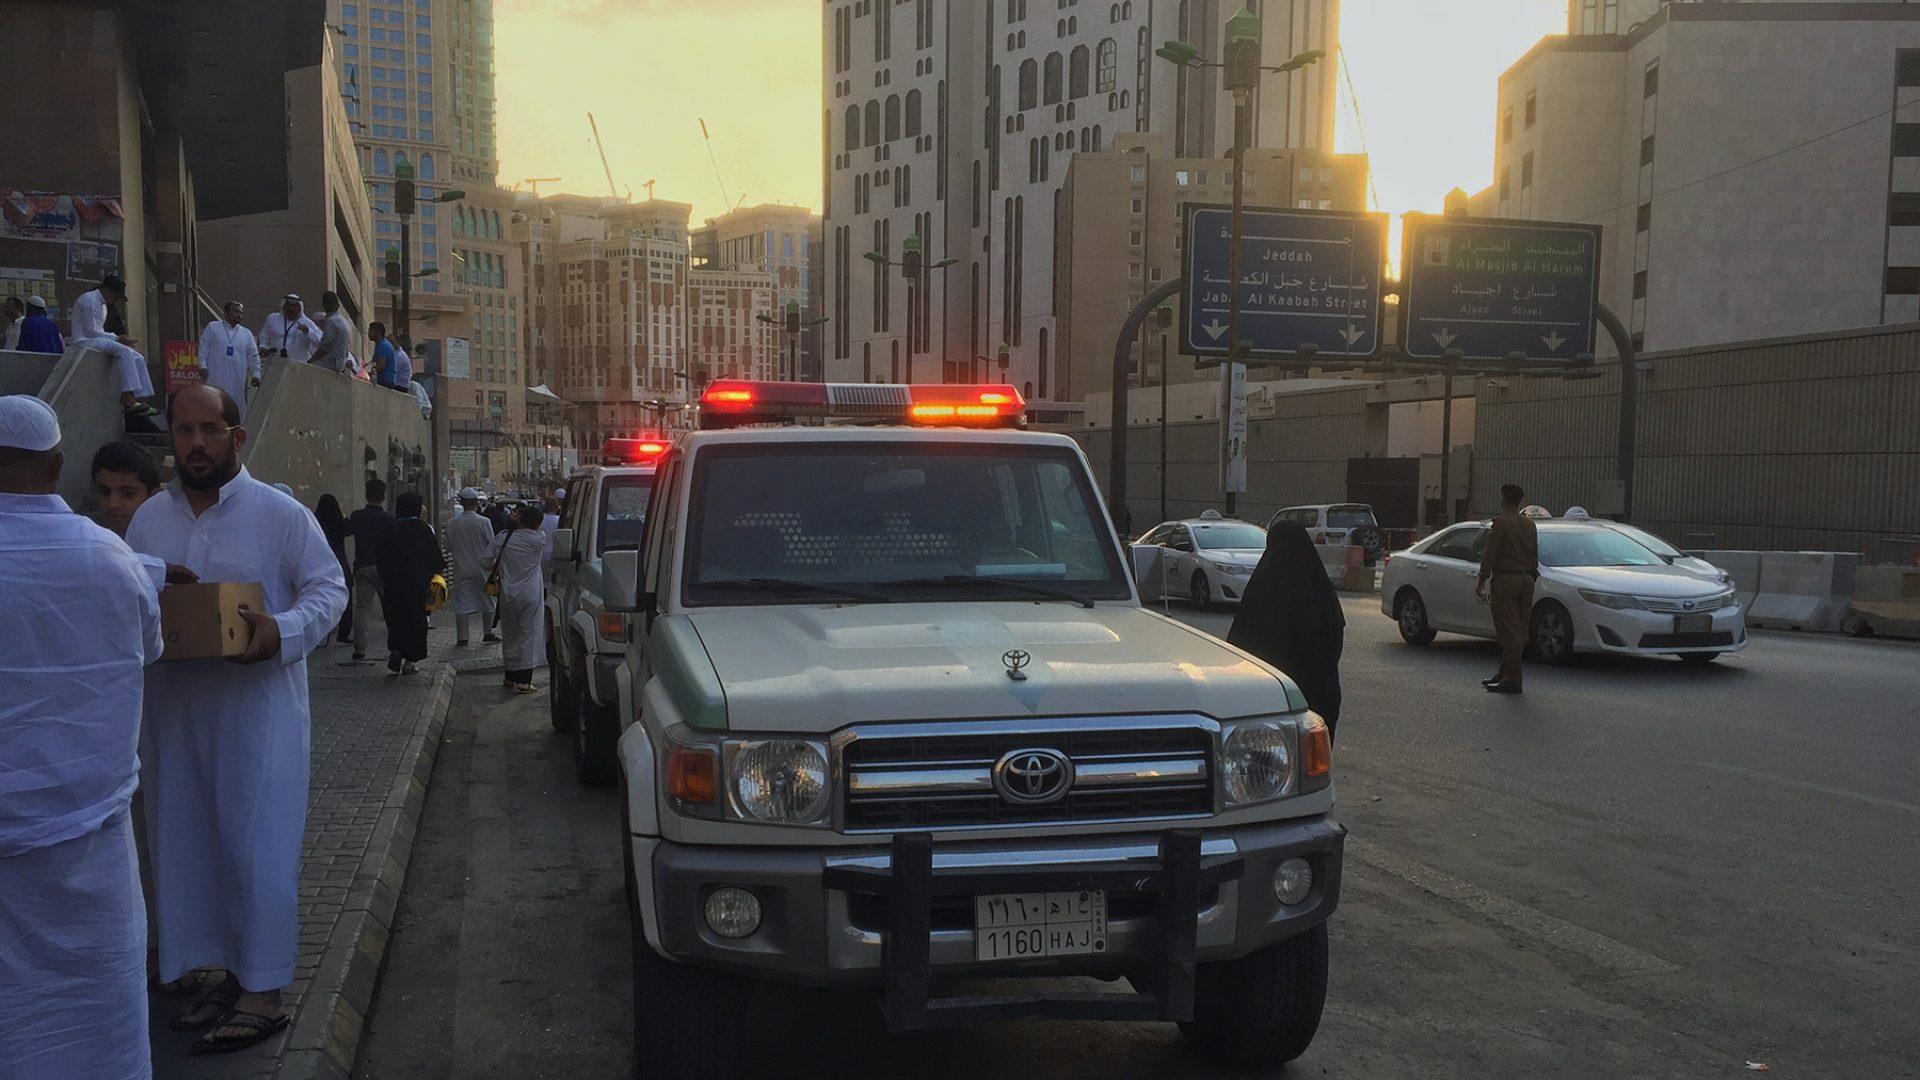 Emergency number in Saudi Arabia